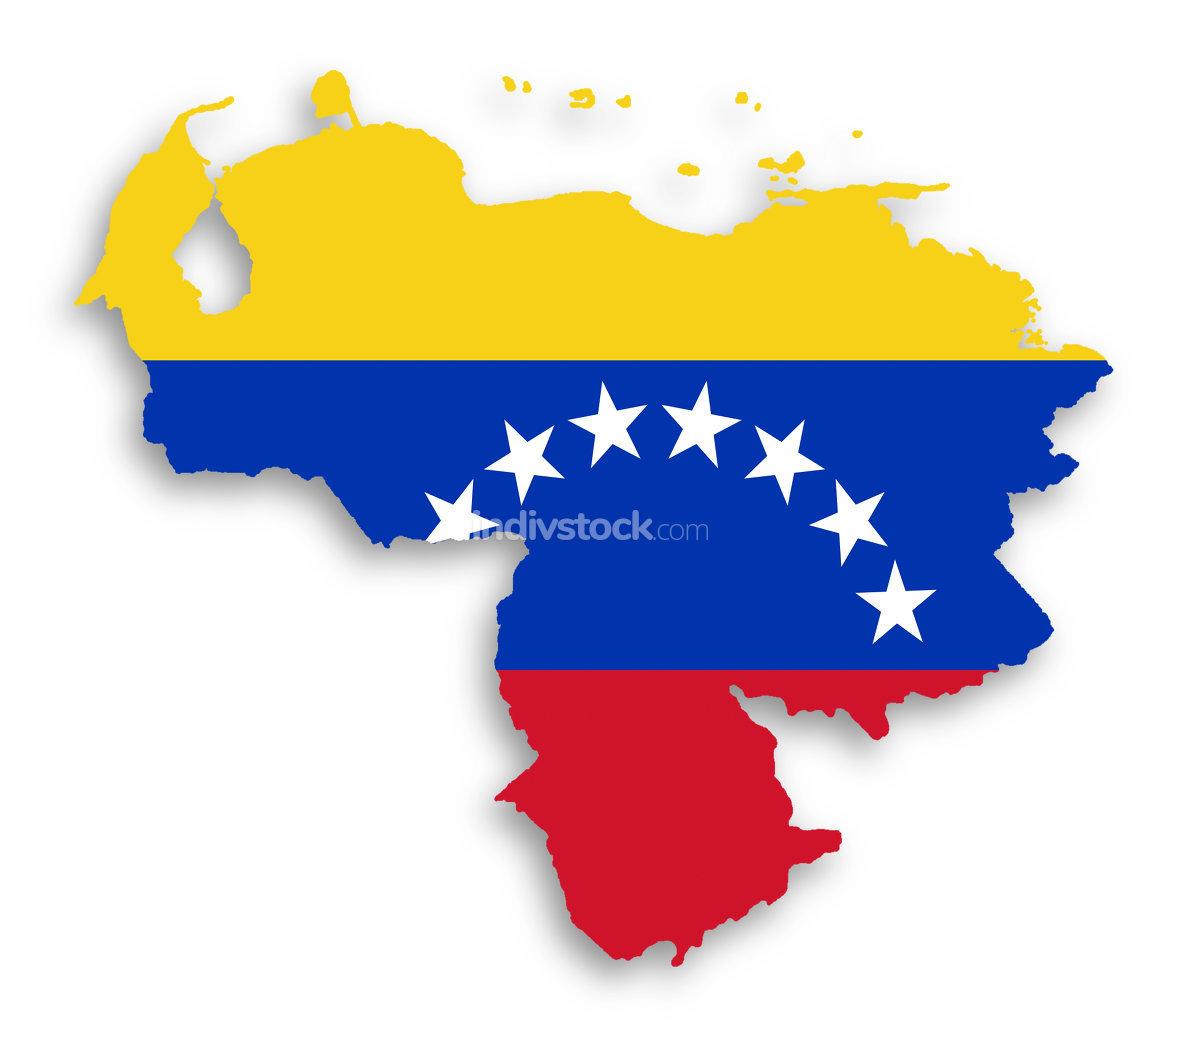 Venezuela map with the flag inside